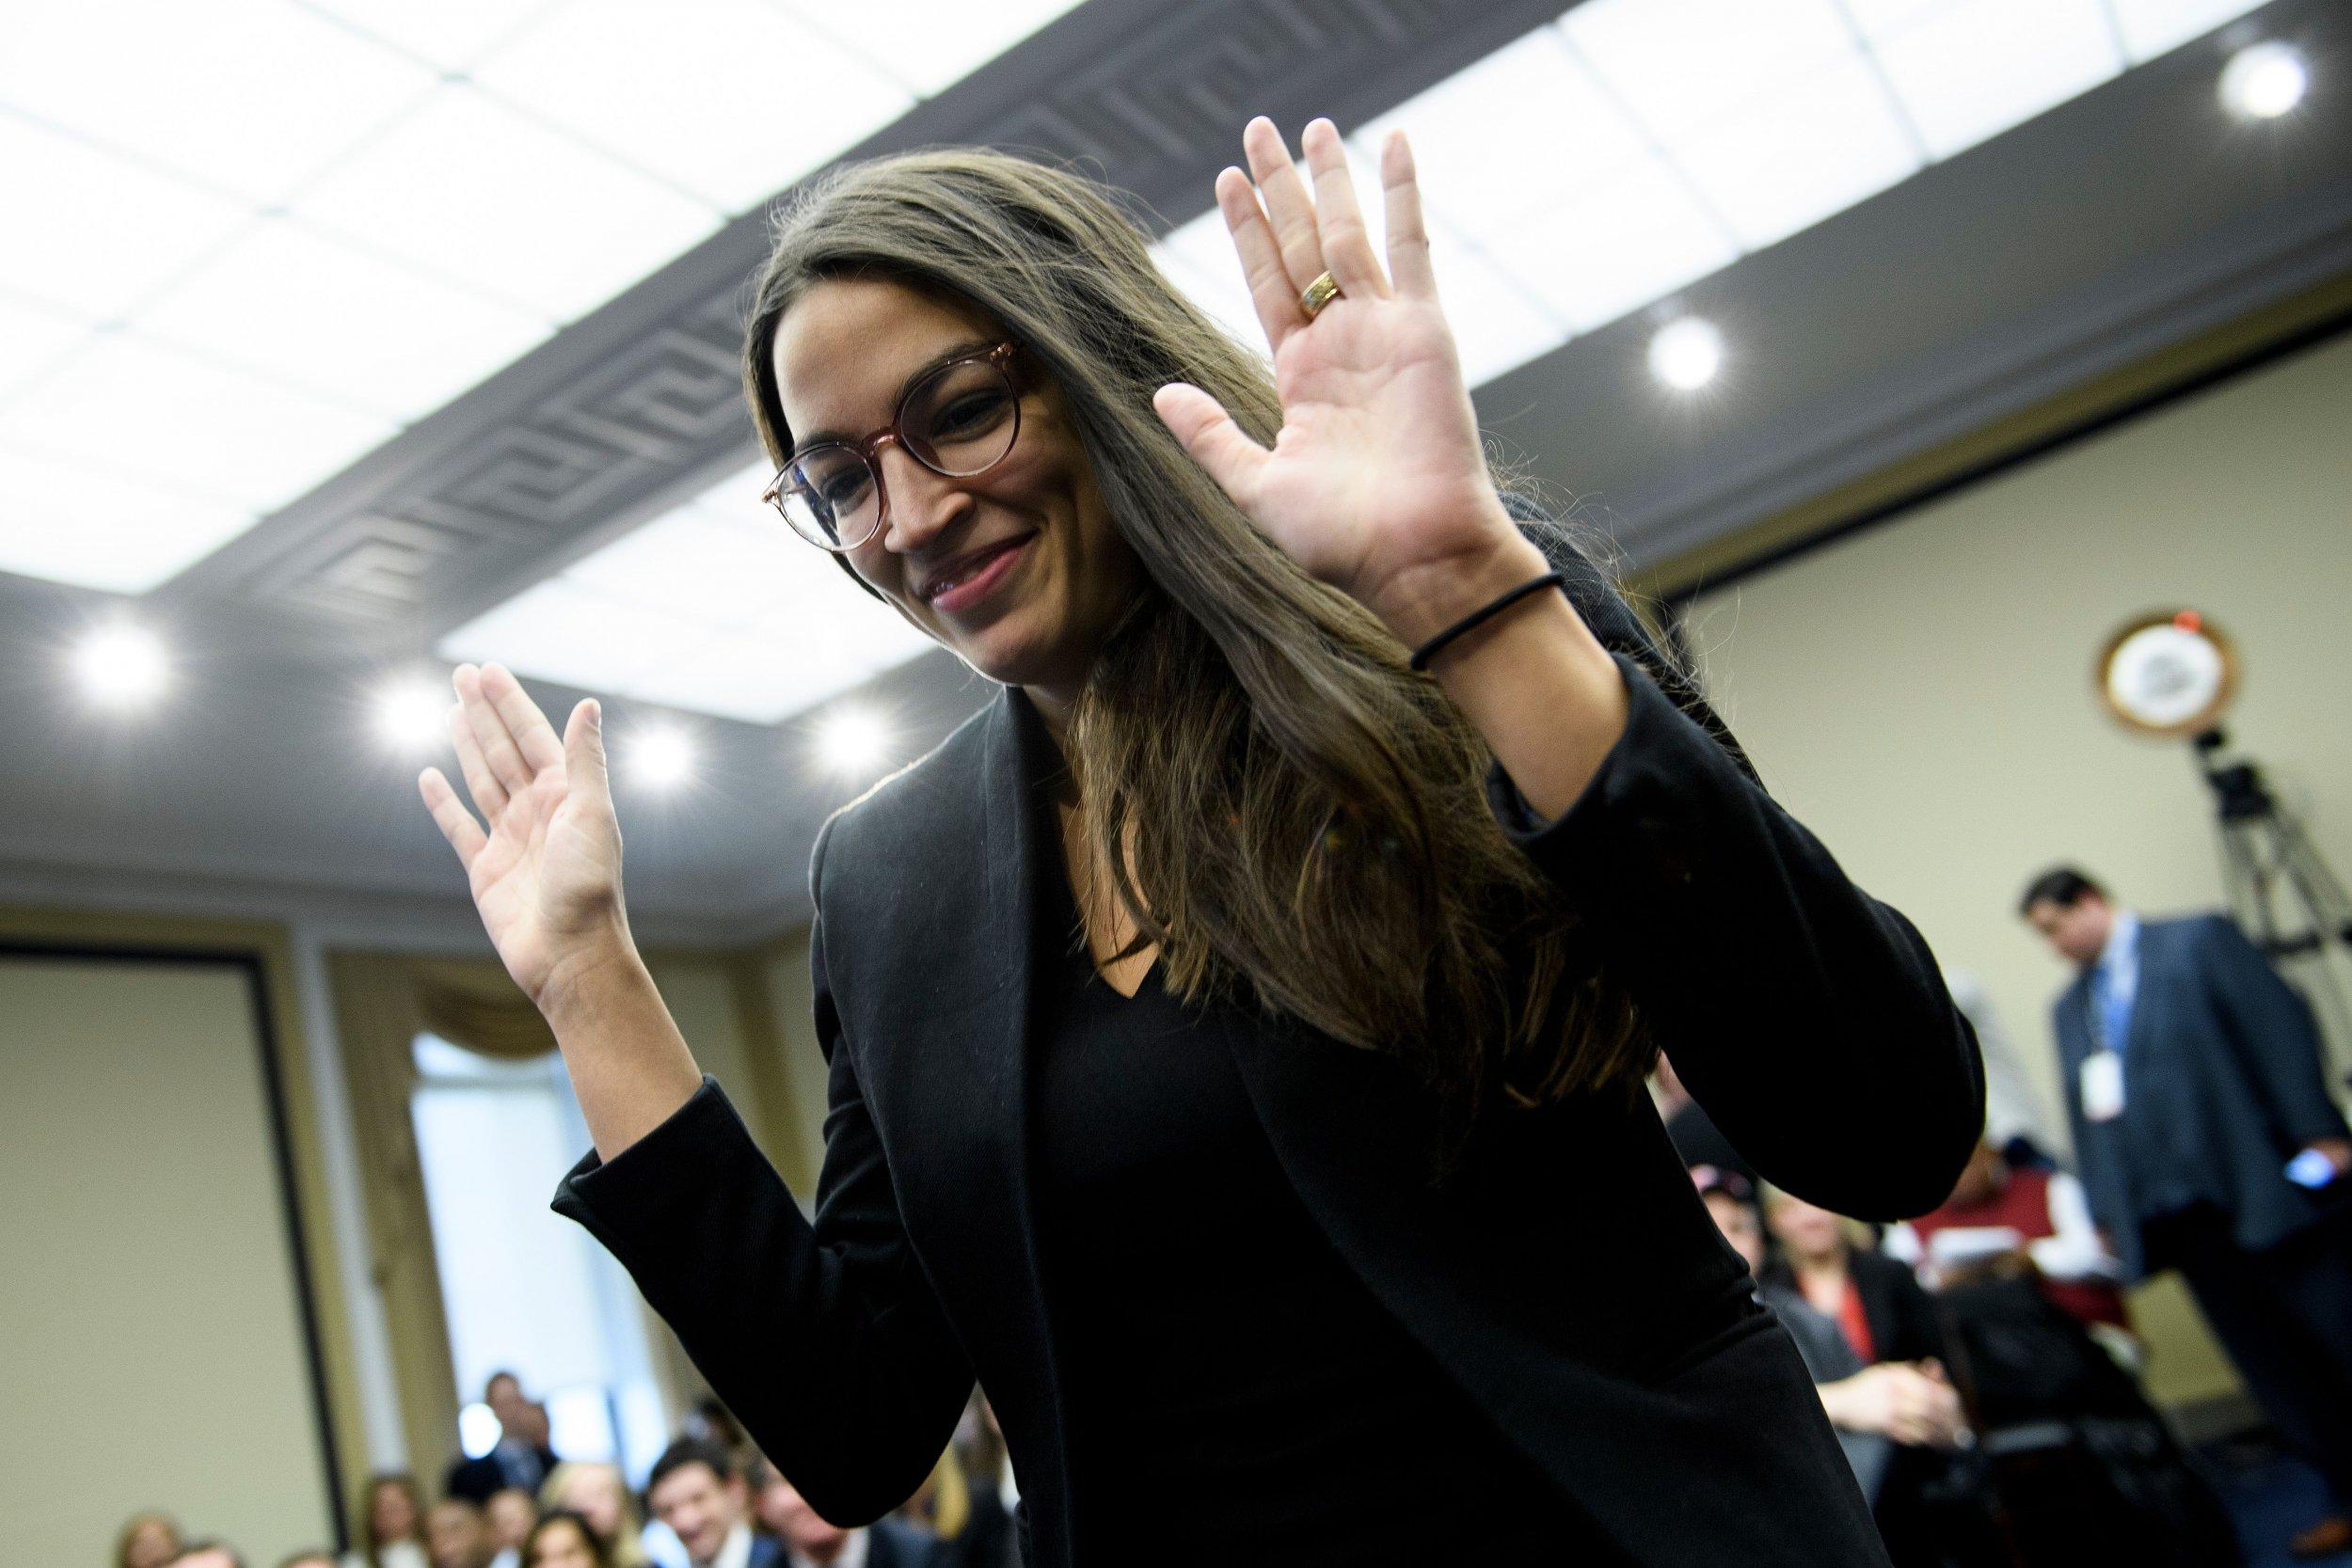 alexandria ocasio-cortez, democrat, claire mccaskill